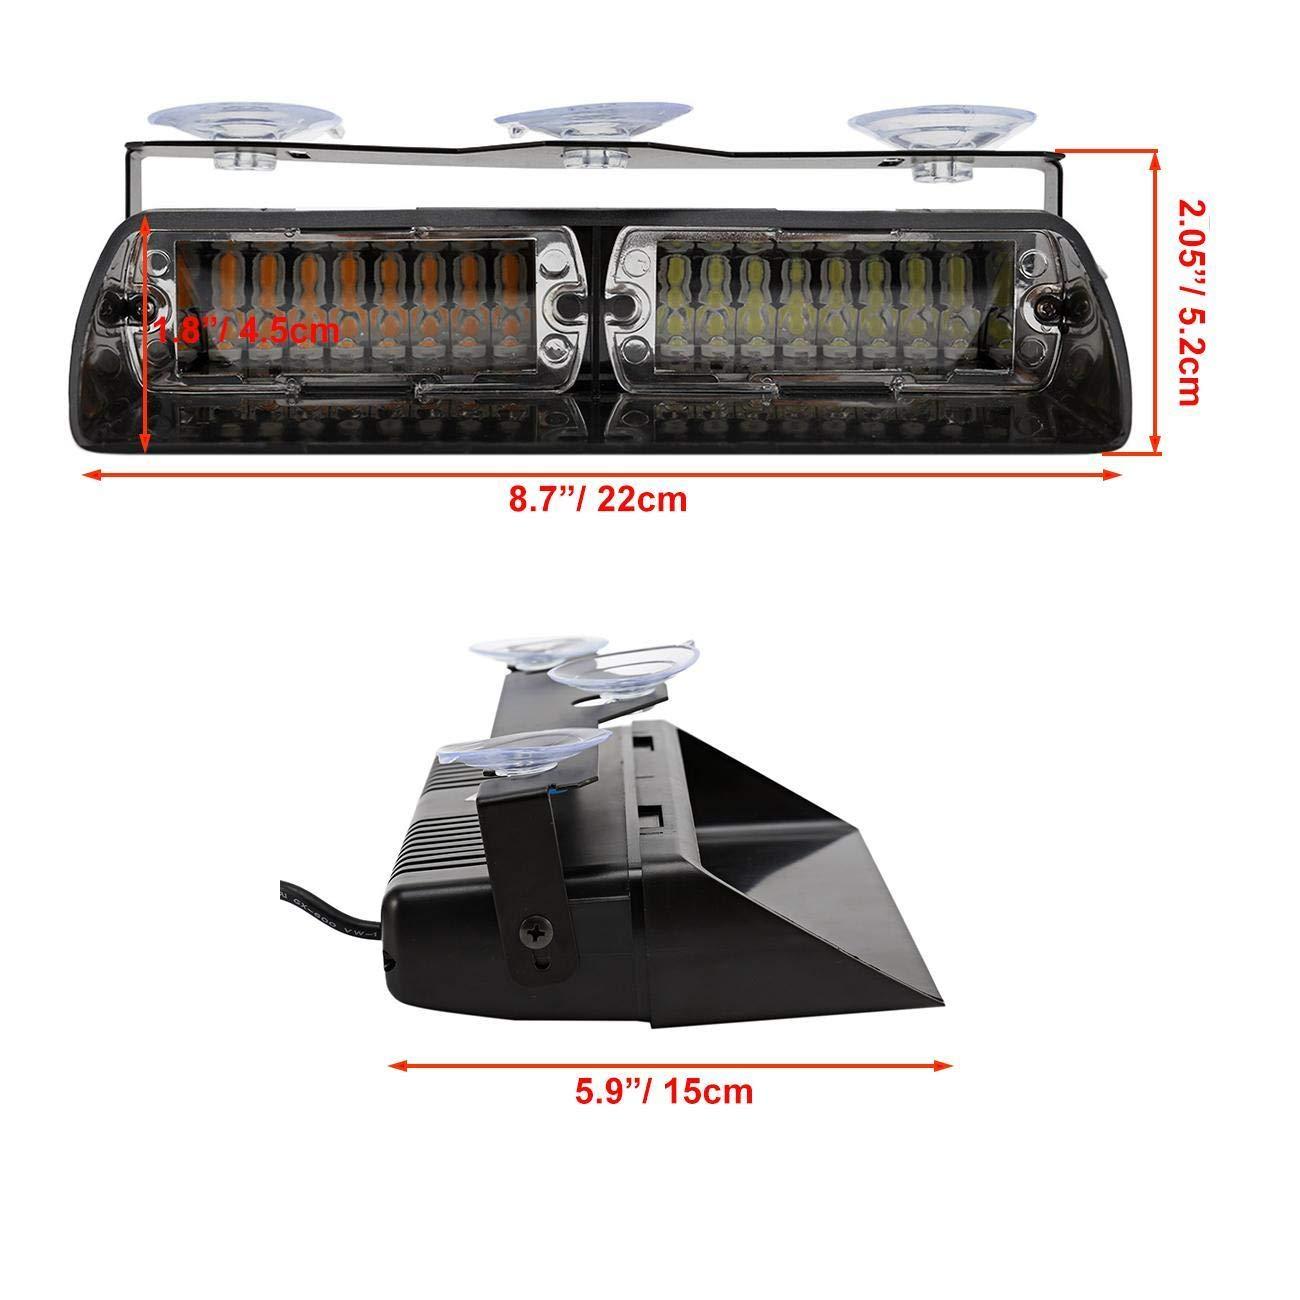 Auxbeam Amber Led Mini Bar Emergency Enforcement Hazard Warning Flash Strobe Lights with Magnetic Base 4350355503